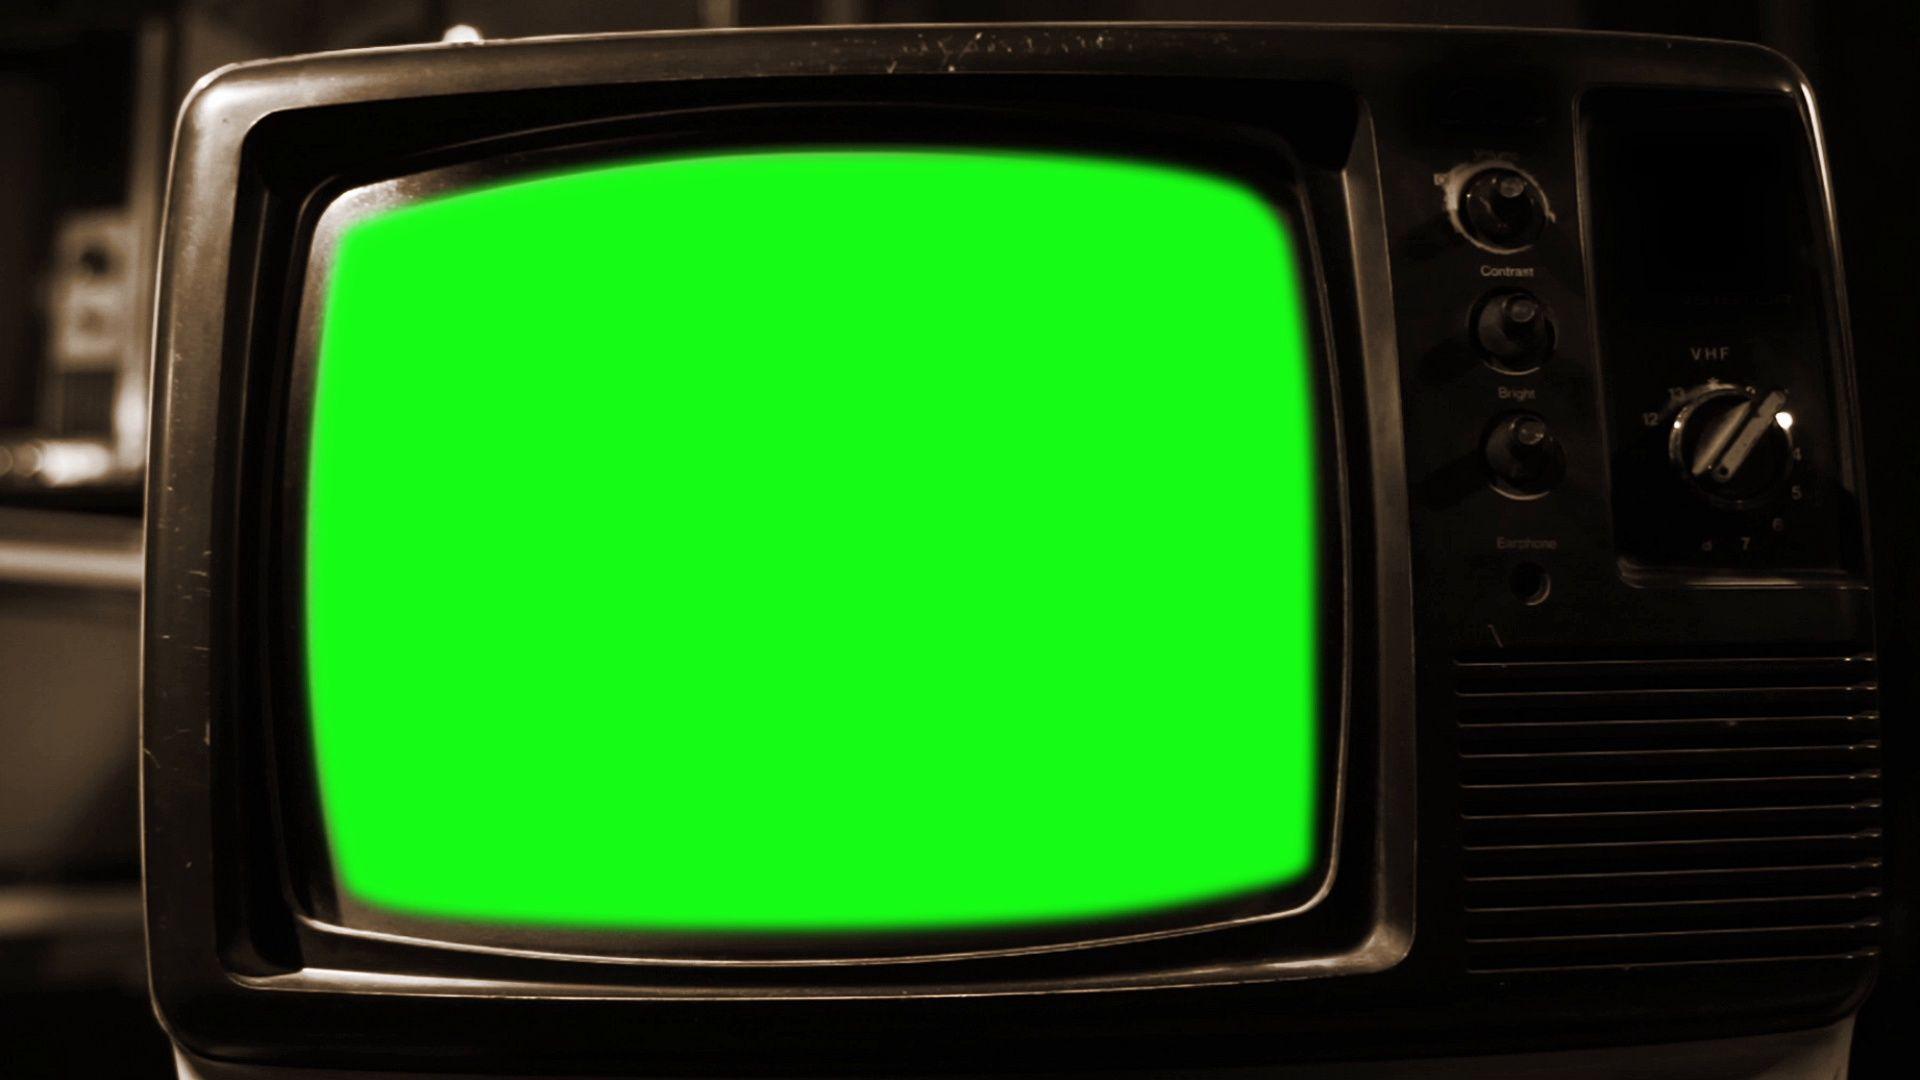 Vintage Tv Green Screen Aesthetics Of The 80s Sepia Tone Zoom In Stock Footage Screen Aesthetics Green Vintage Gambar Garis Bingkai Foto Gambar